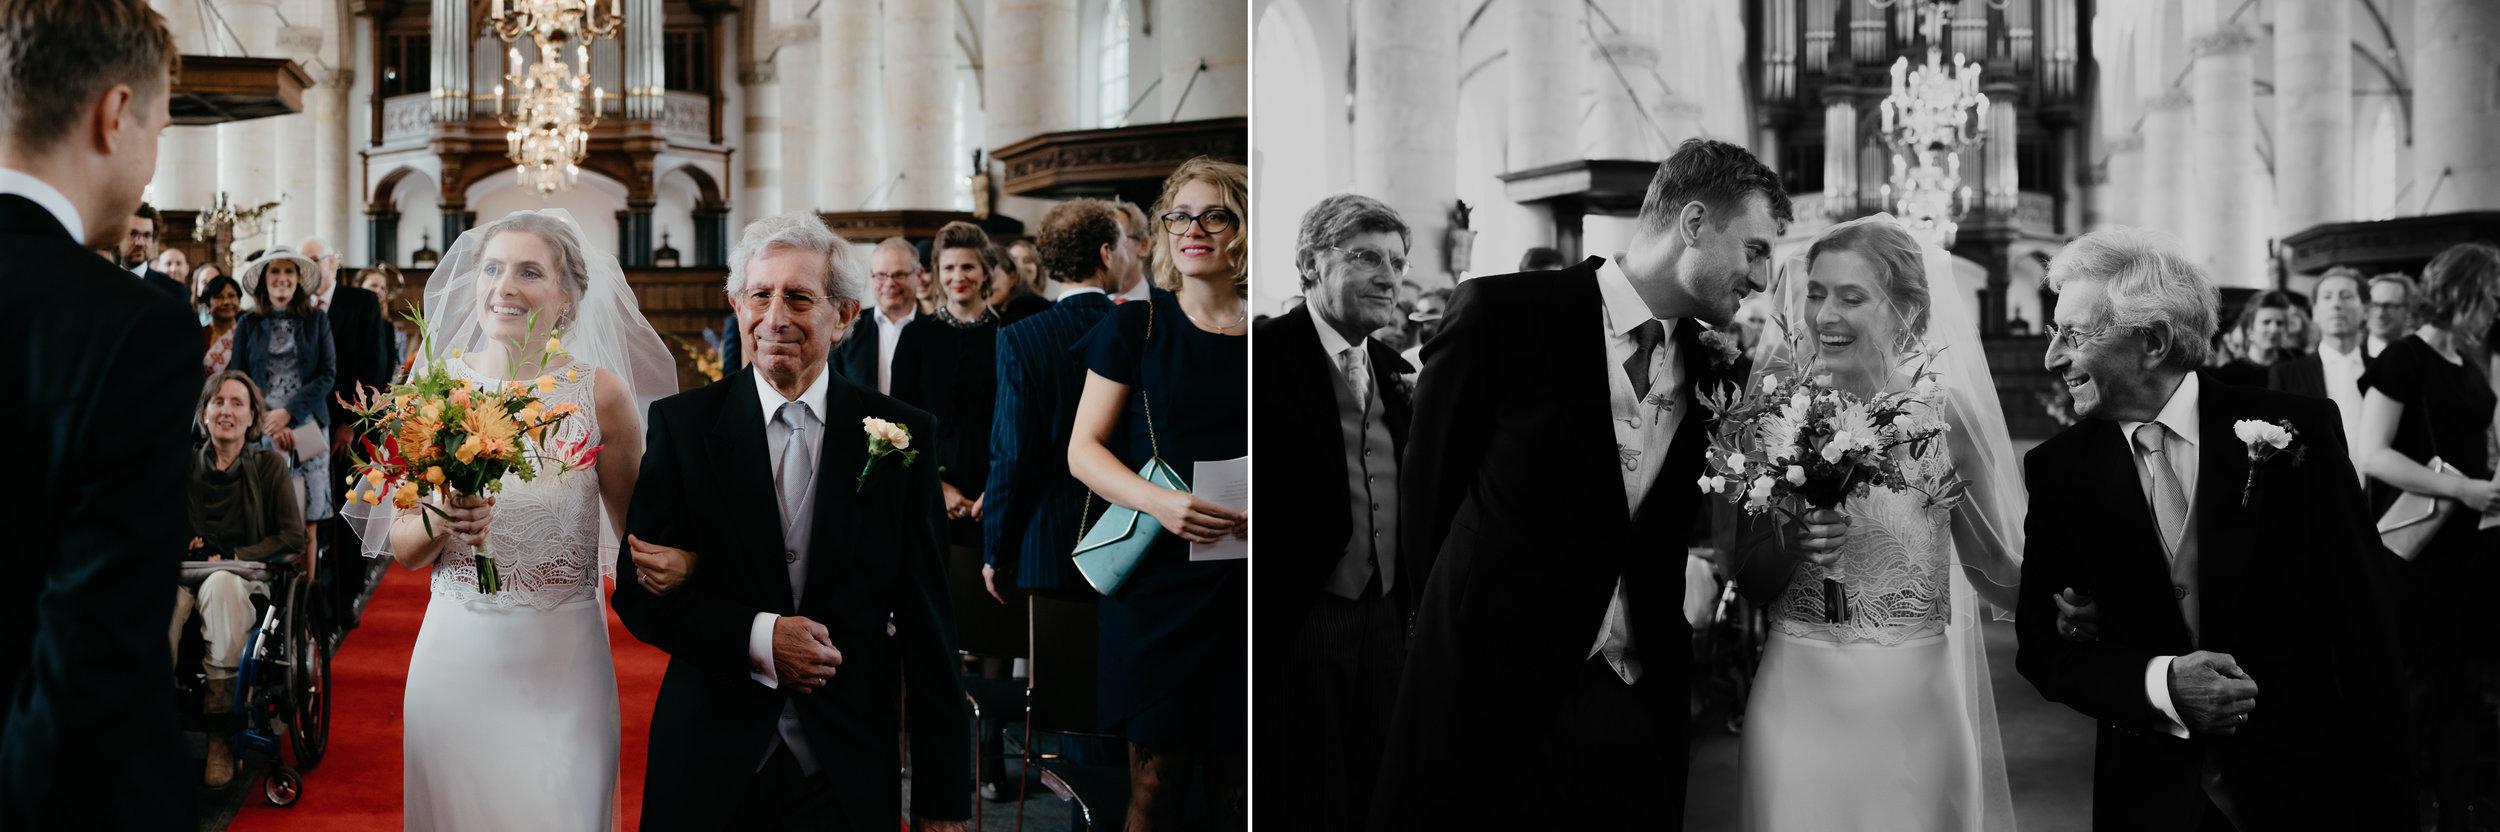 Wedding ceremony inspiration photographer in amsterdam